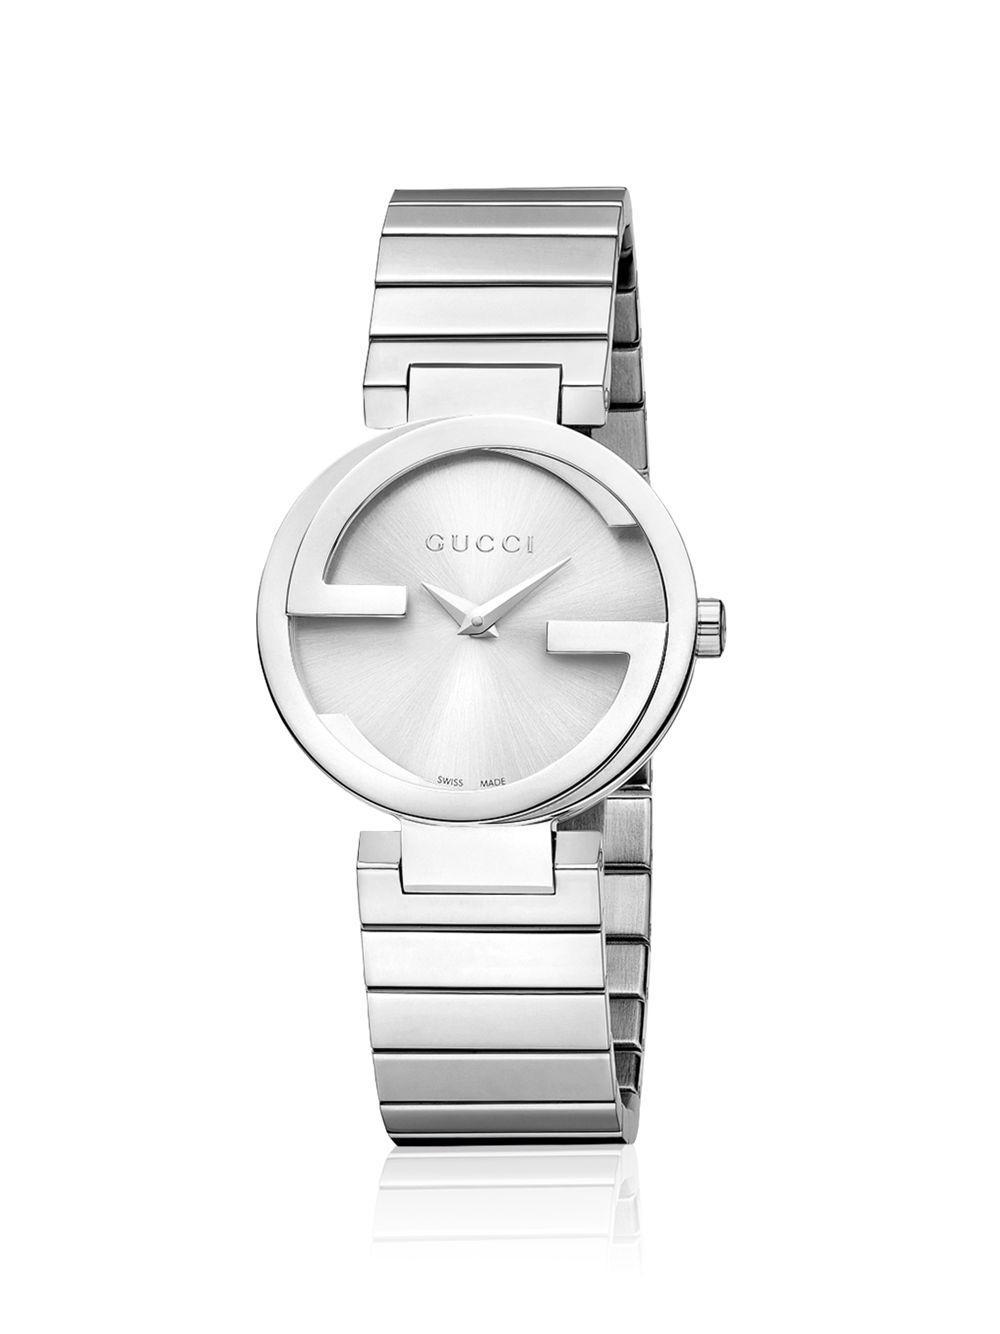 6be55d0b80d Lyst - Gucci Interlocking Stainless Steel Bracelet Watch silver in ...